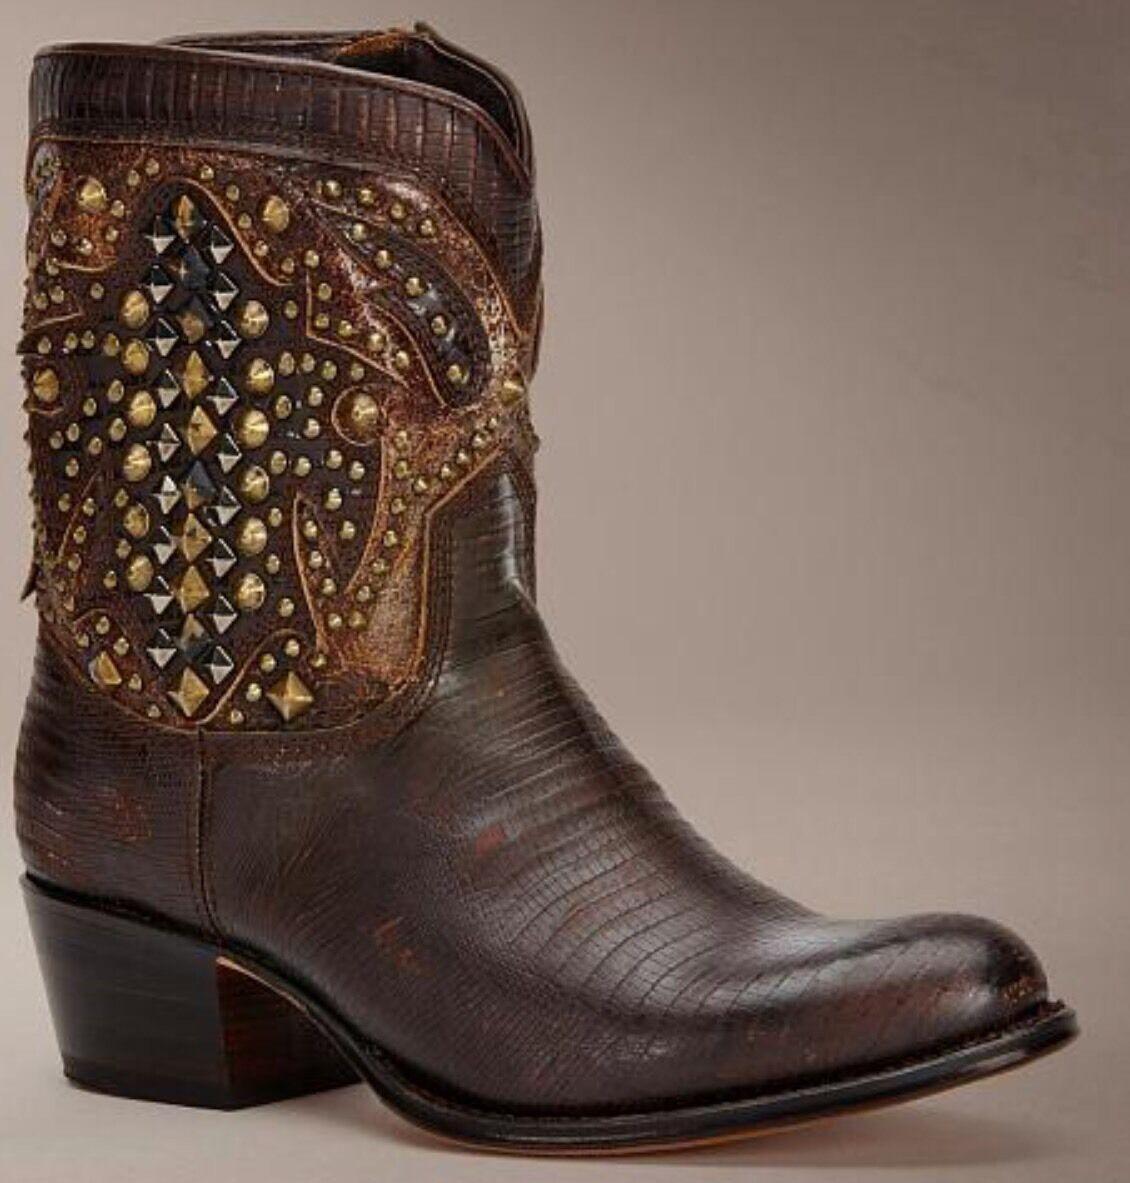 New FRYE Deborah Deco Short Boots Brown Leather 7